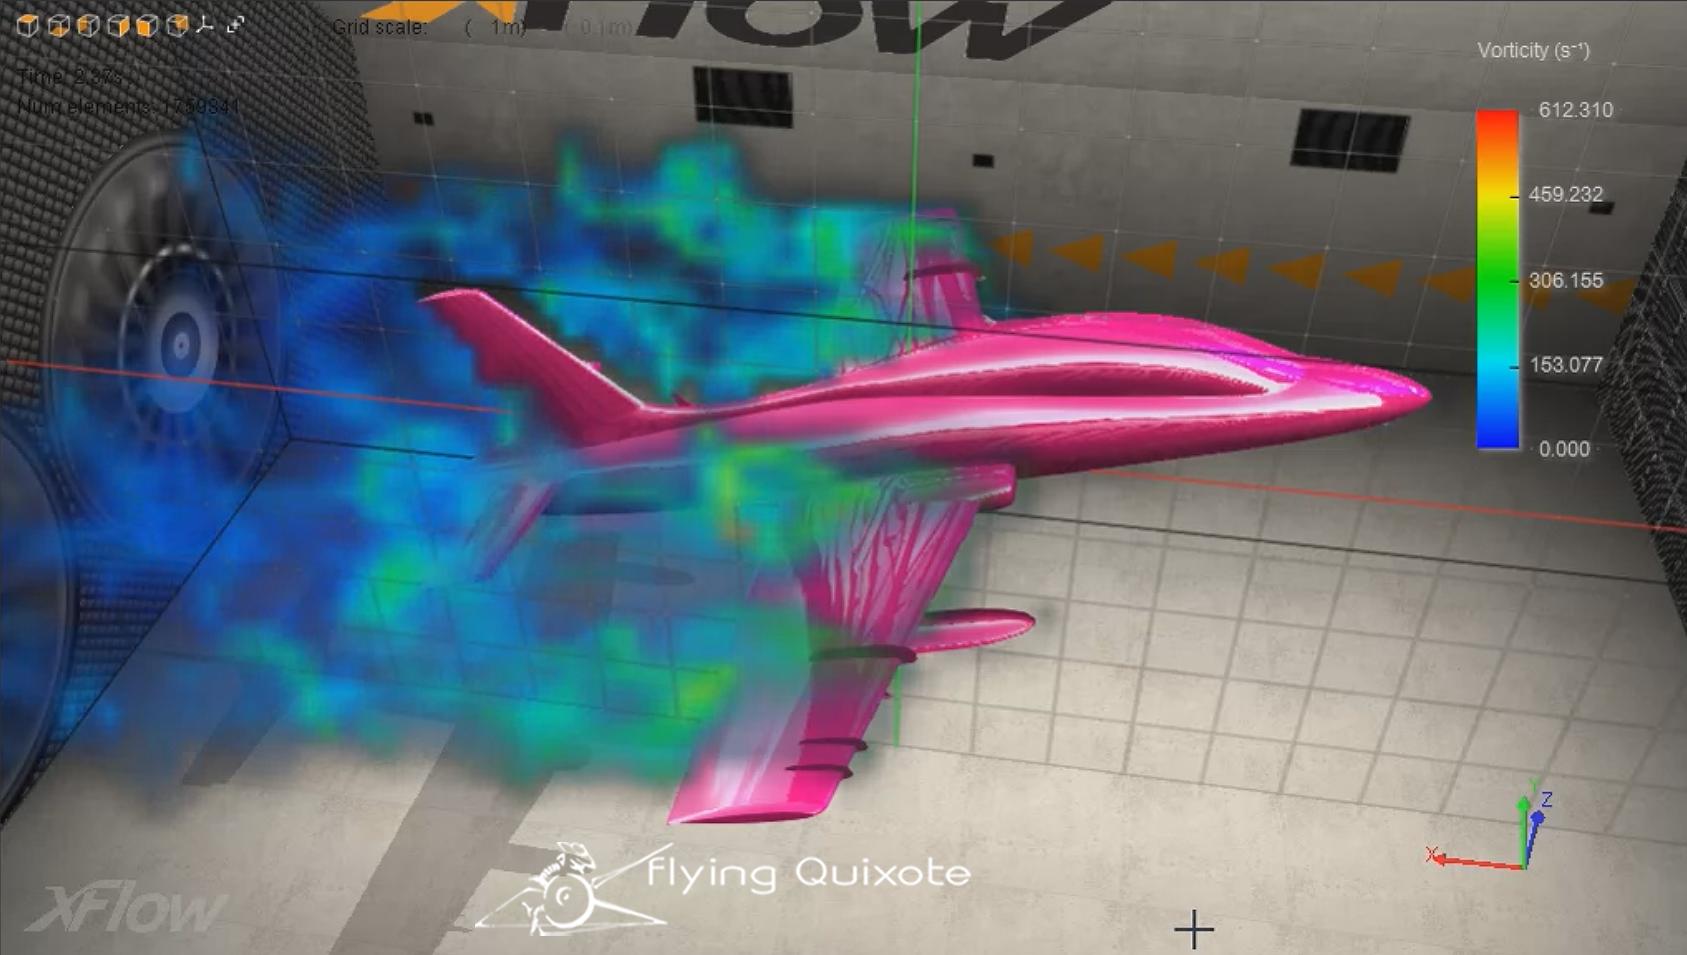 MB-339 flight dynamics